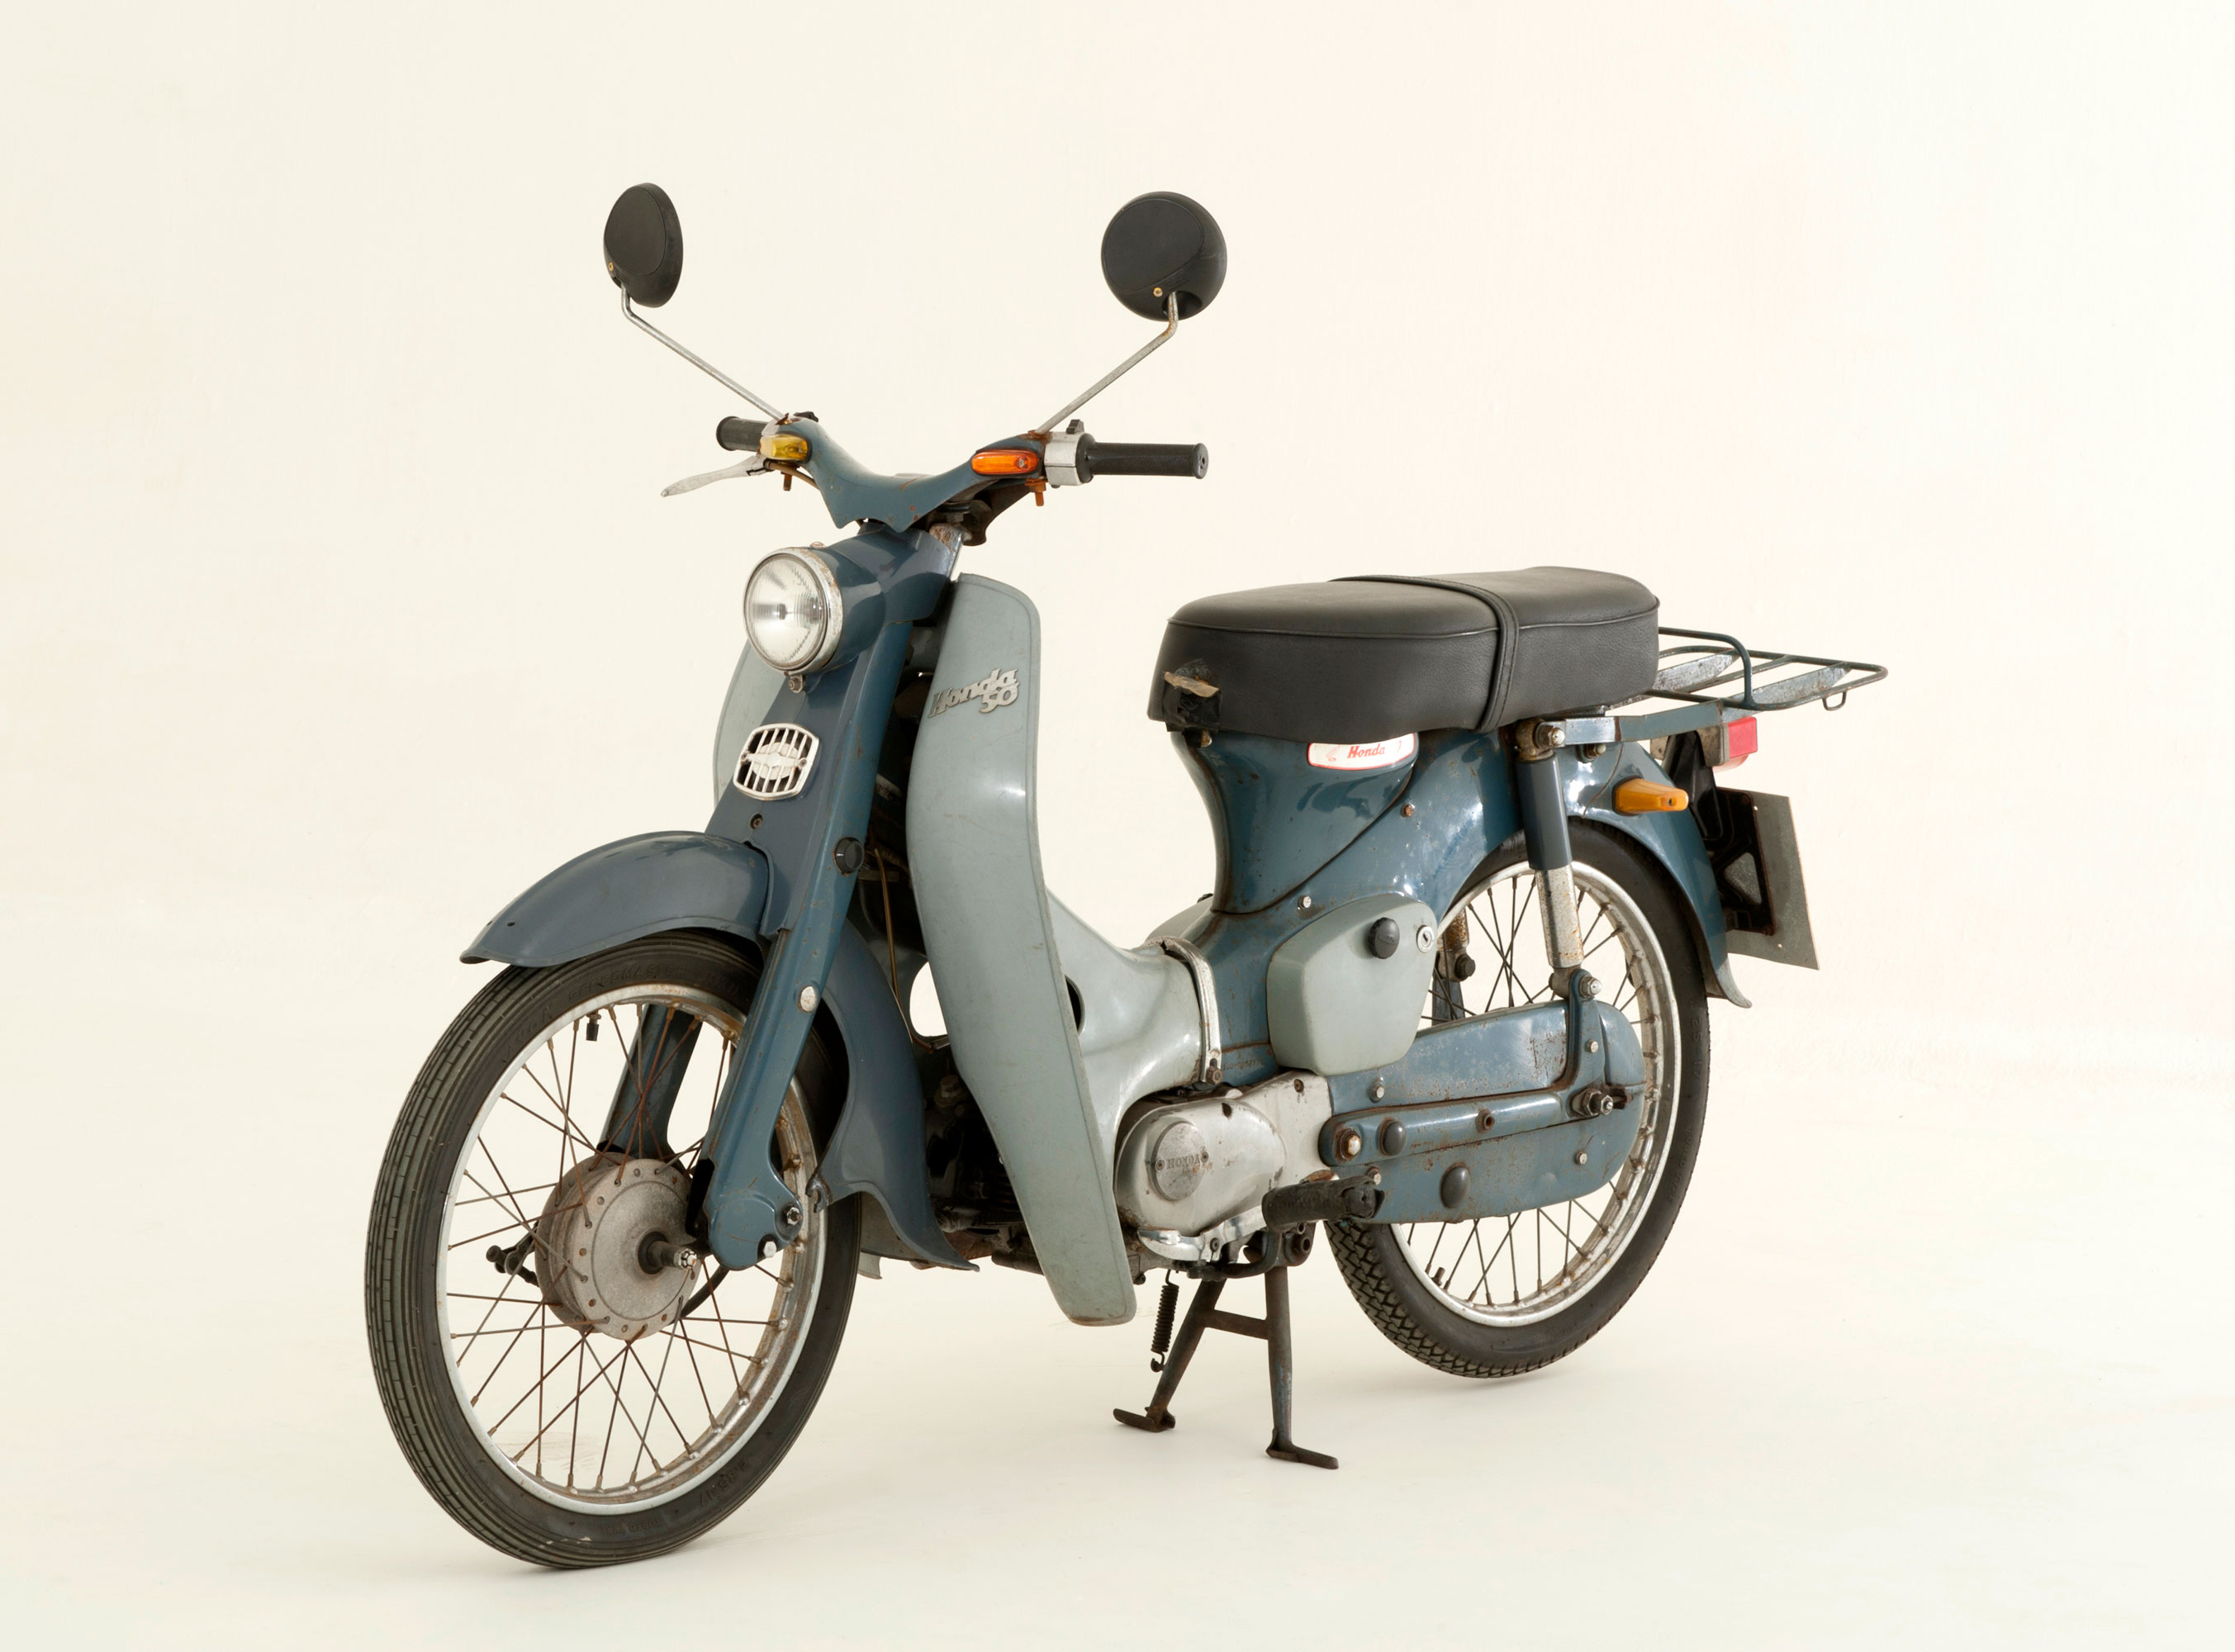 A 1964 Honda C50 Scooter